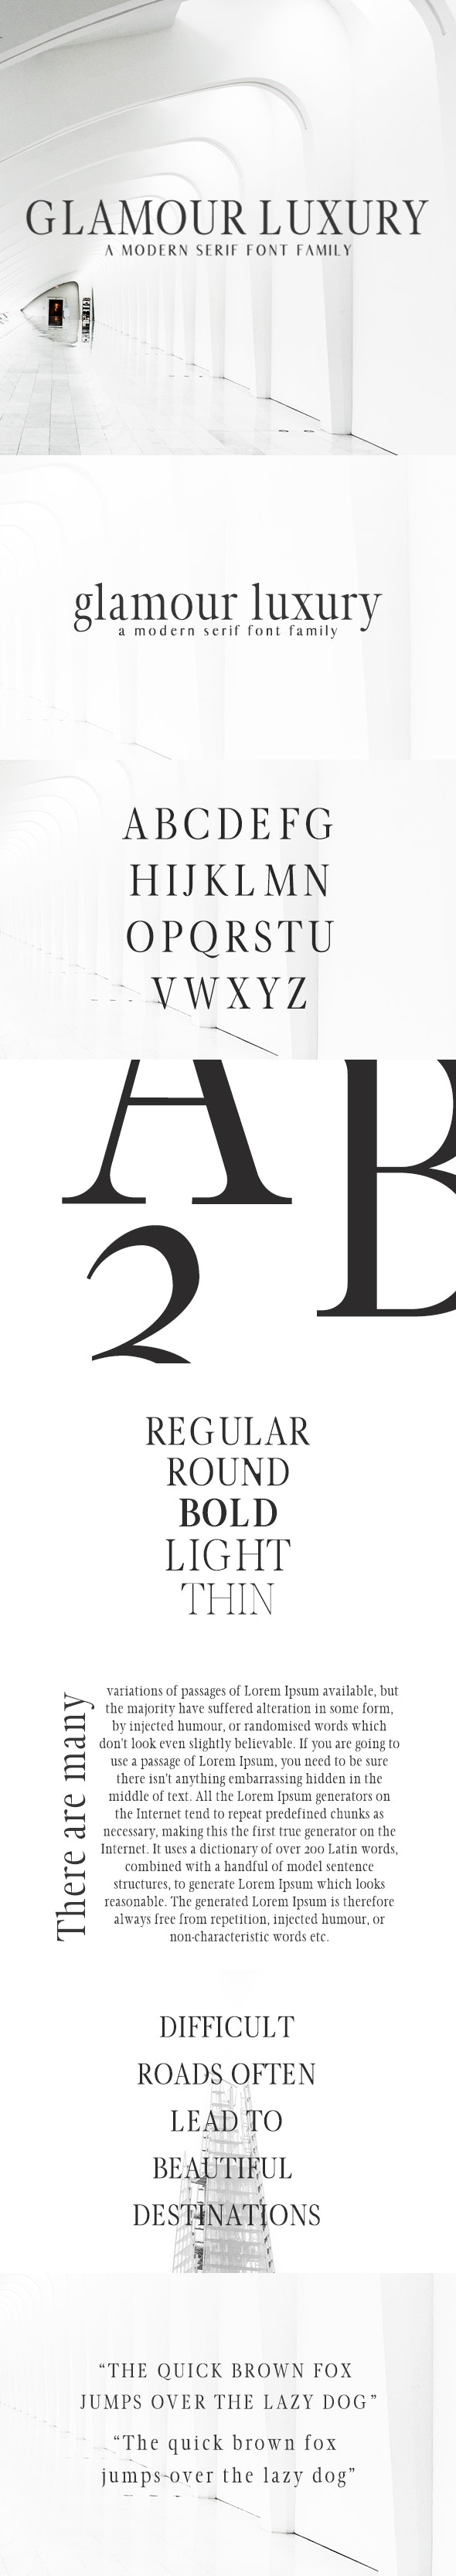 Glamour Luxury Serif Font Family - Serif Fonts